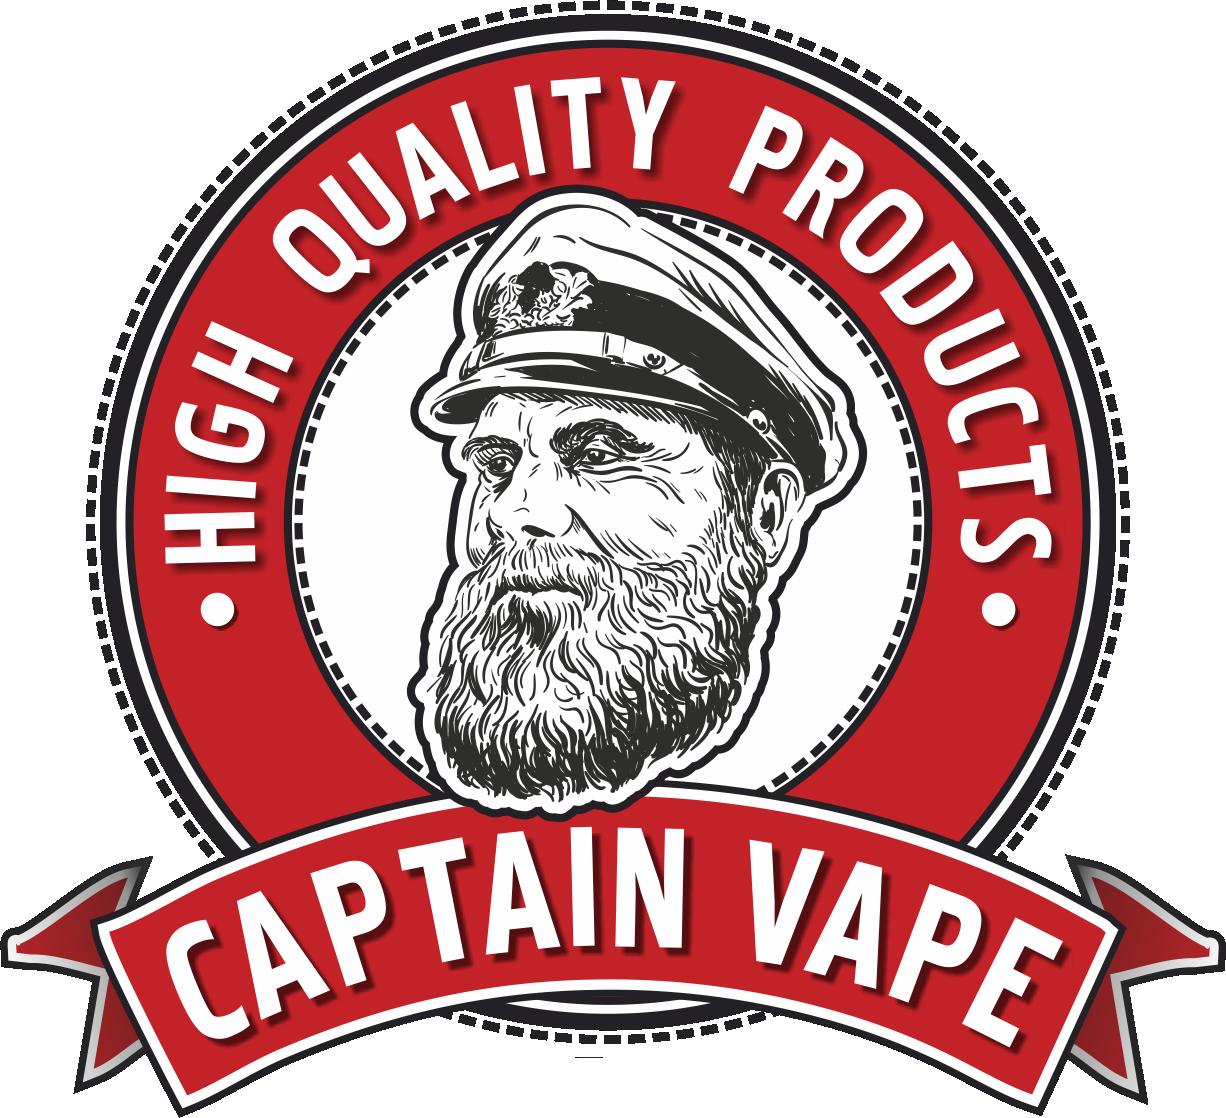 Captain Vape